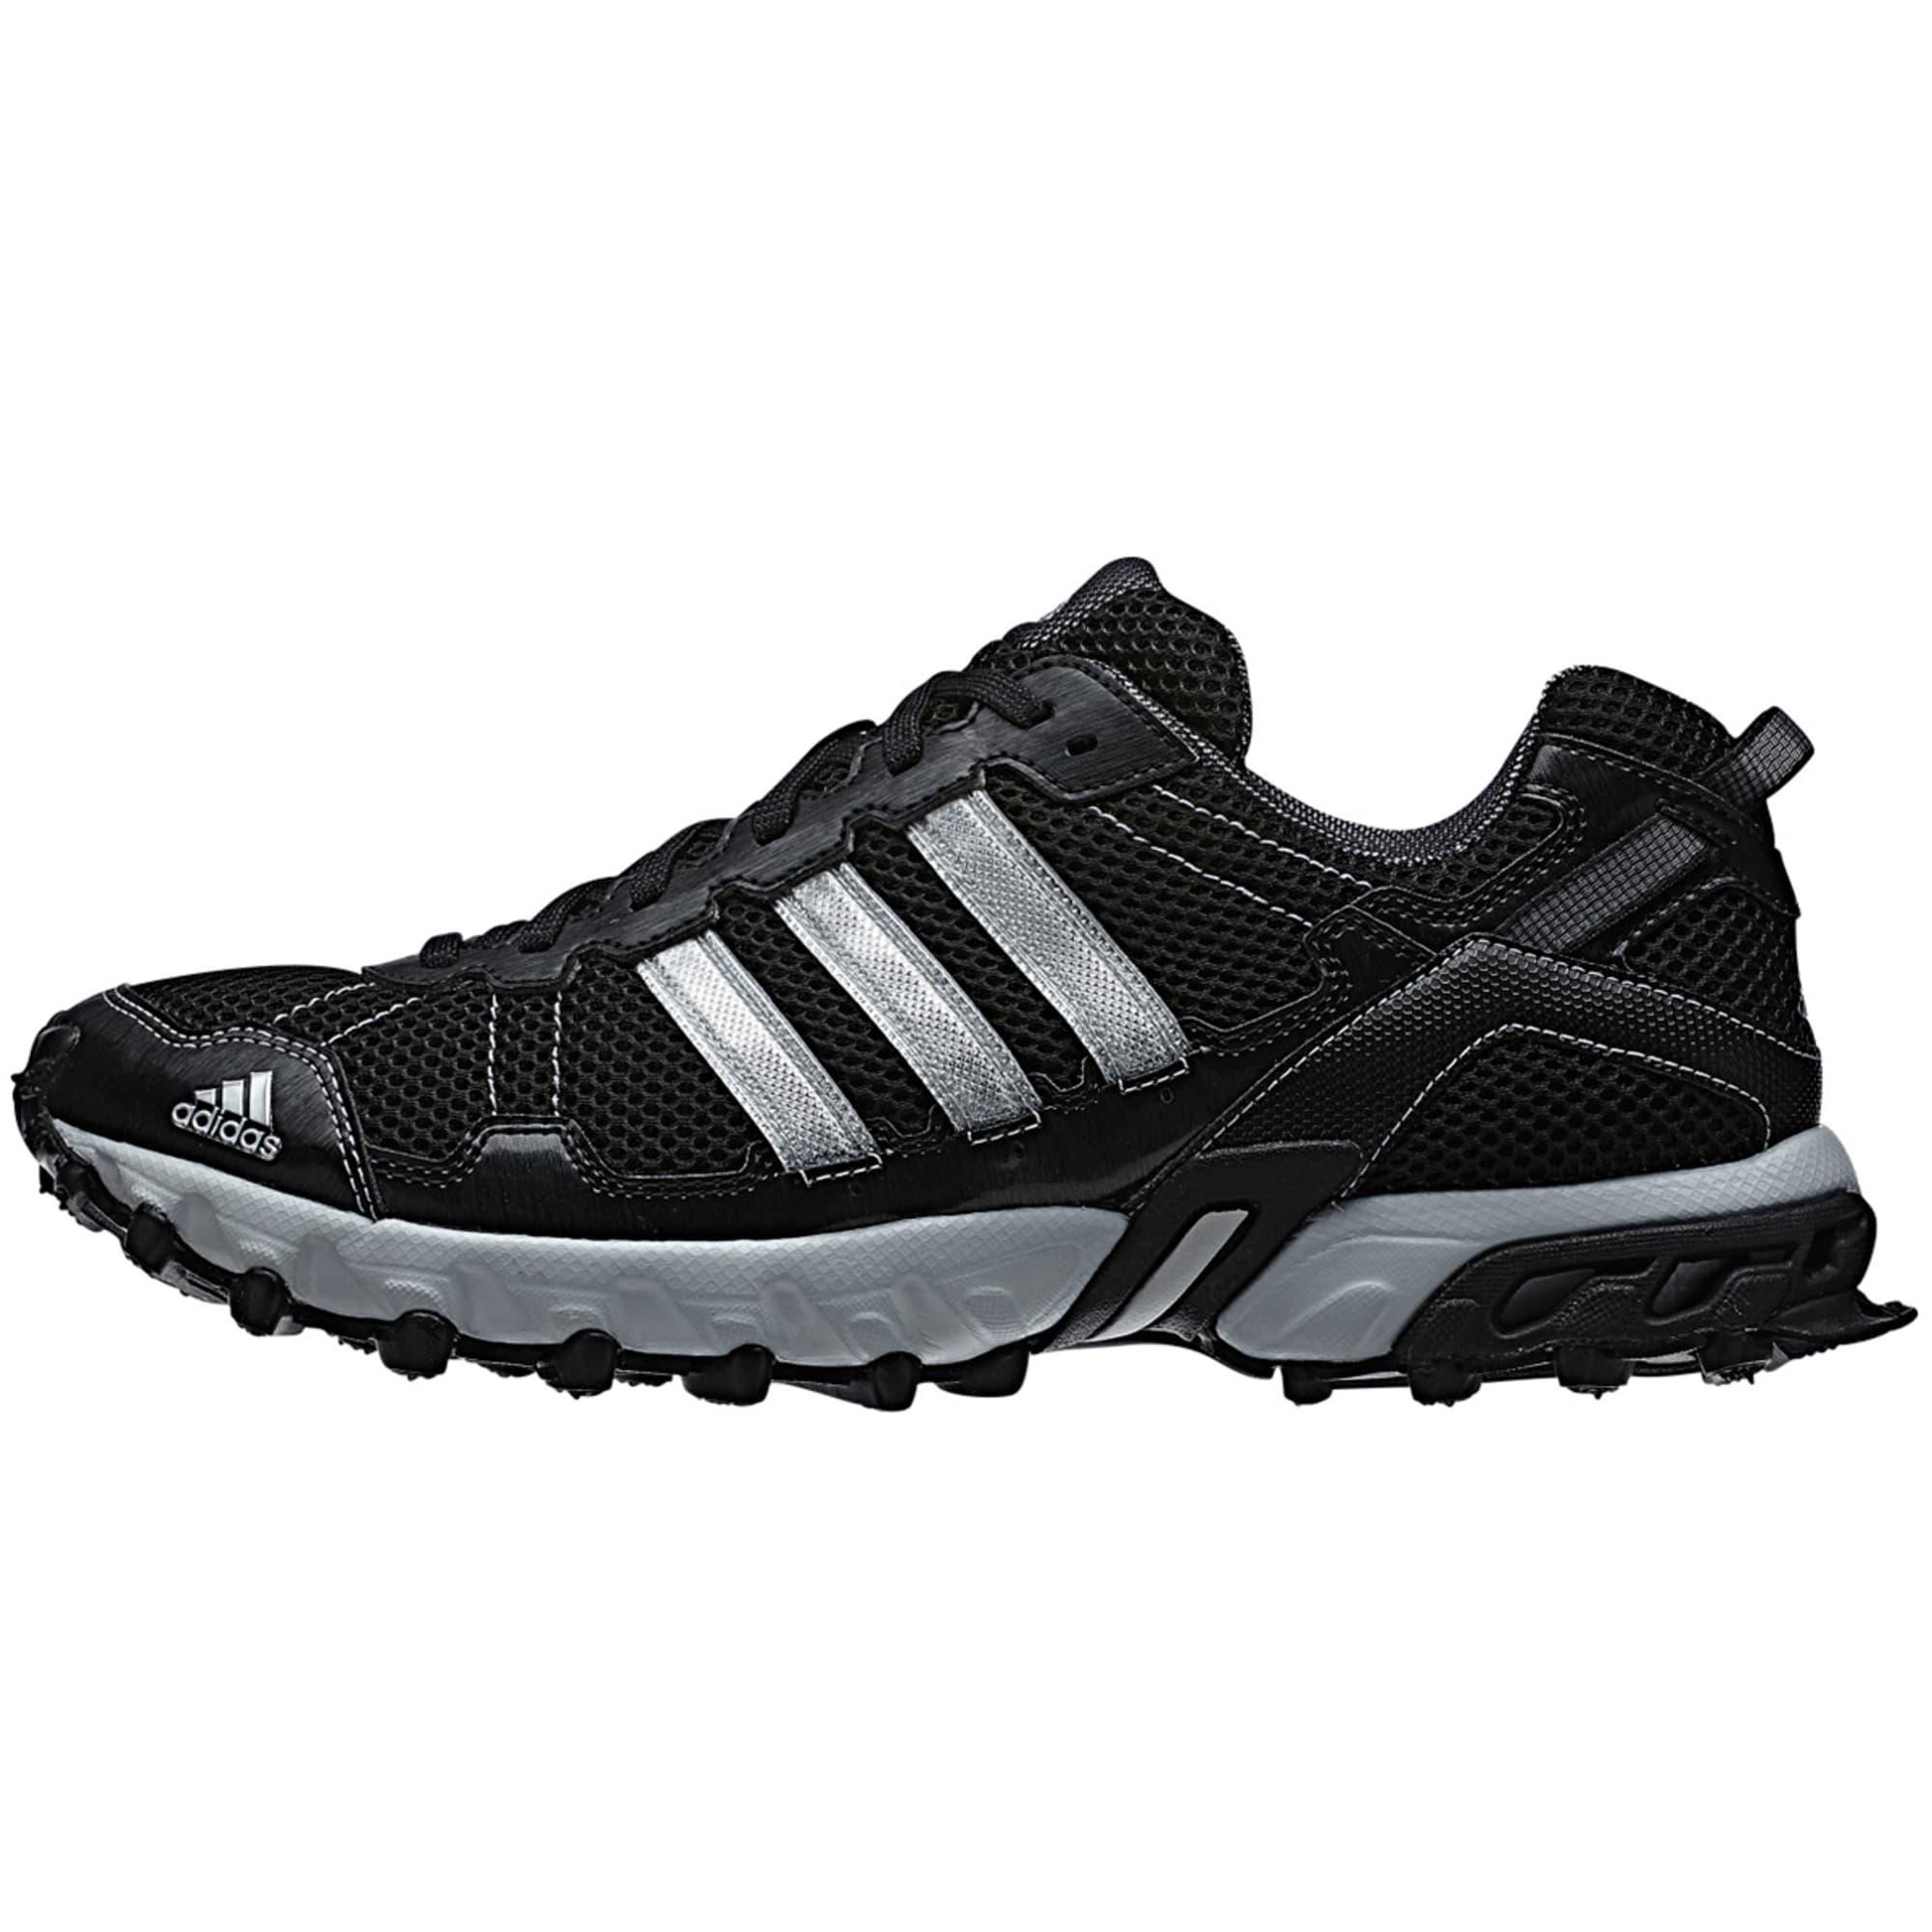 ADIDAS Men's Thrasher 1.1 M Trail Running Shoe